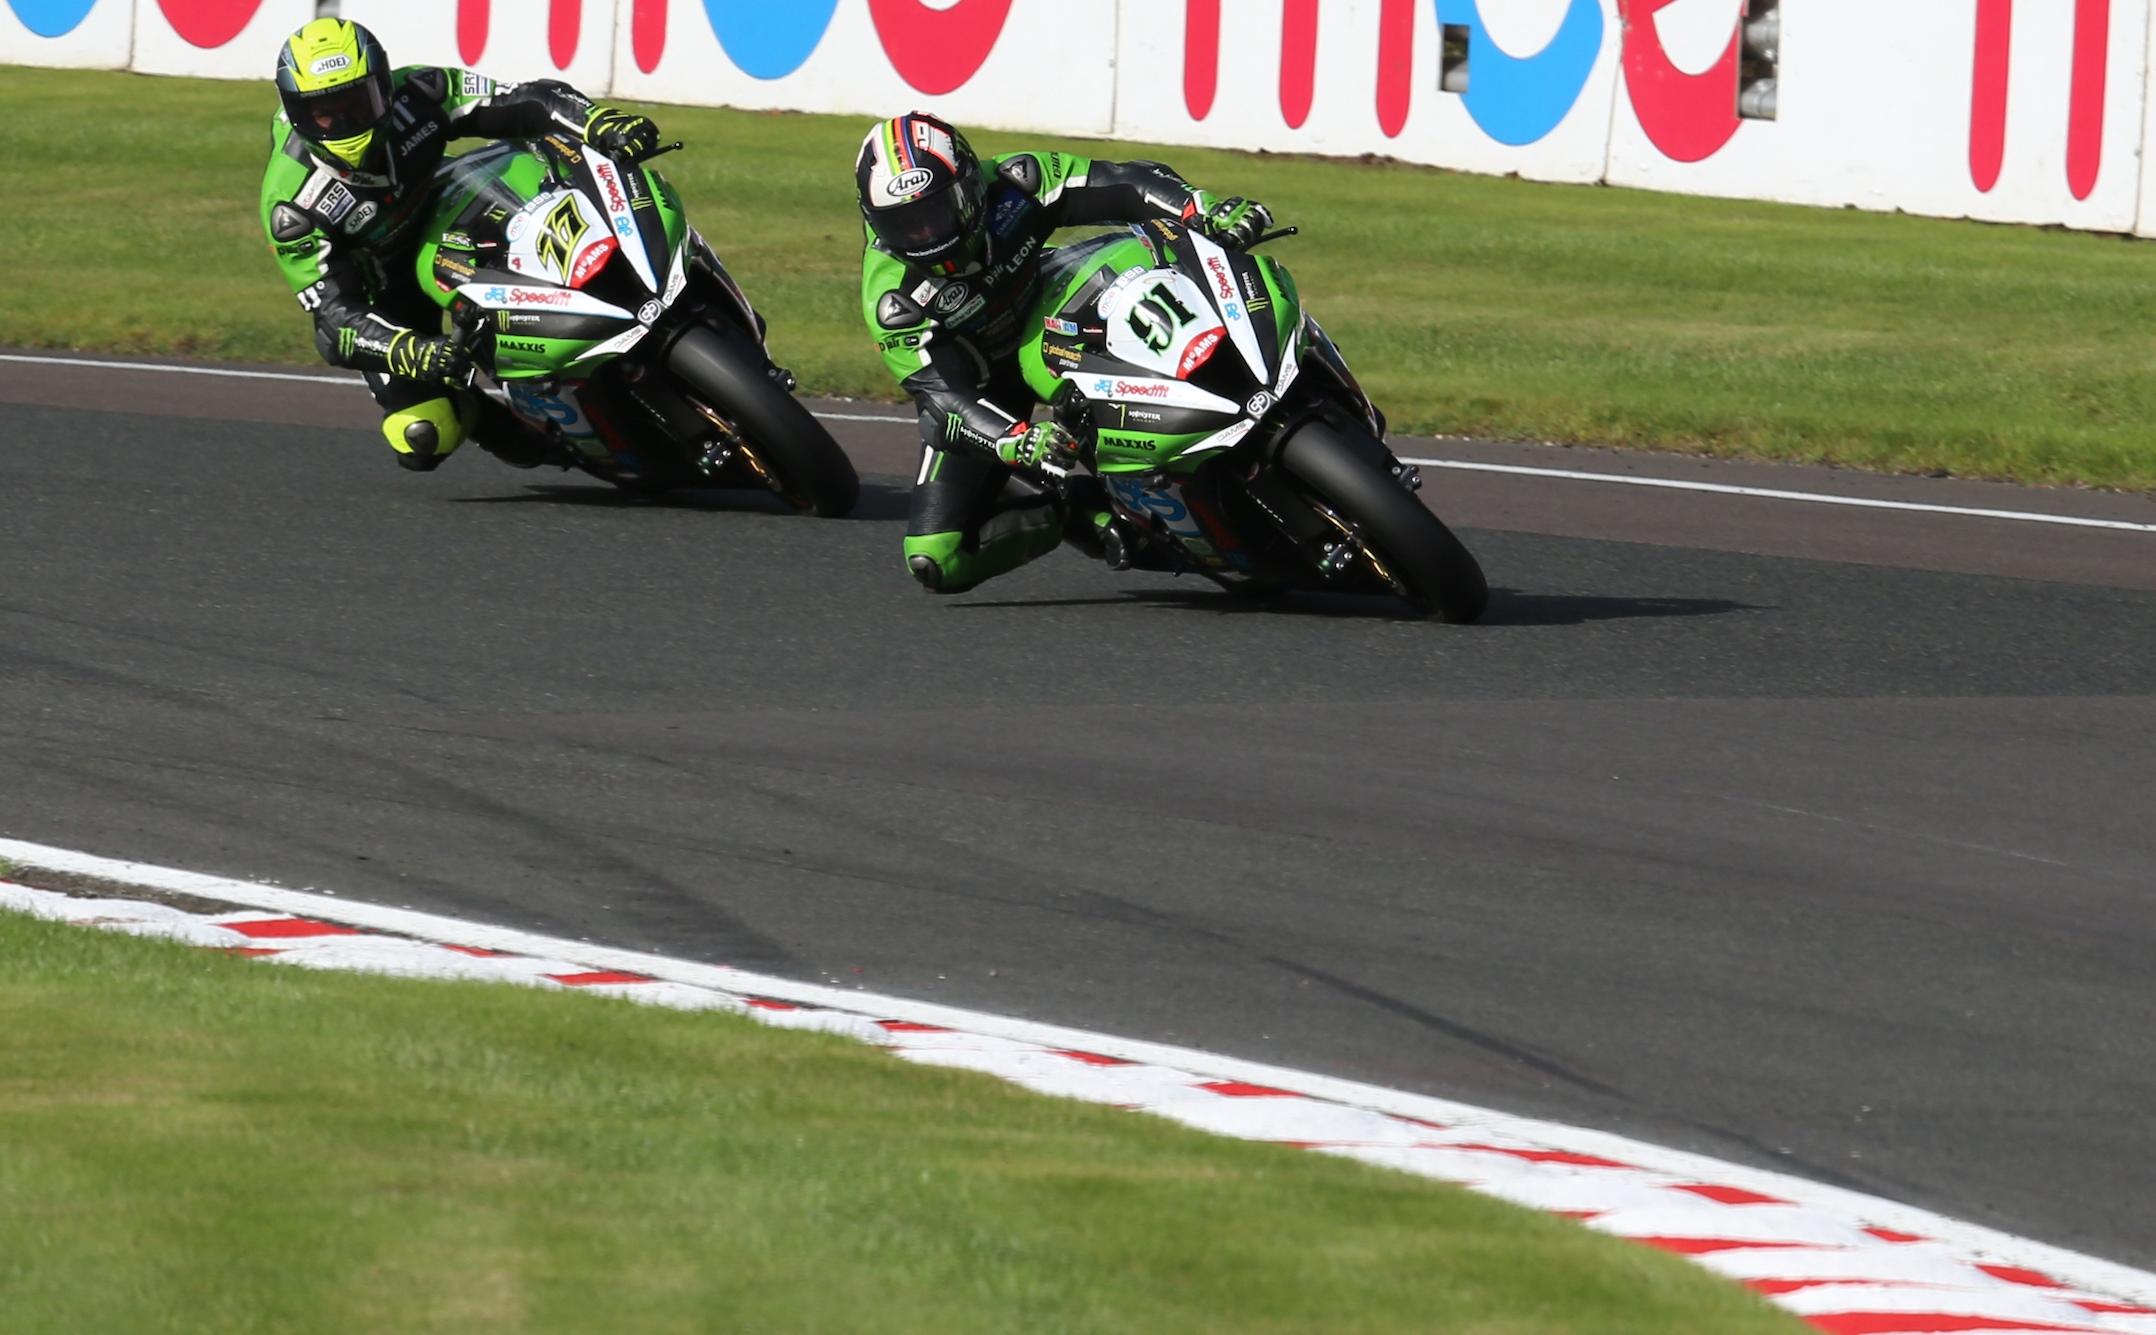 Haslam and Ellison BSB 2016, image credit JG Speedfit Kawasaki